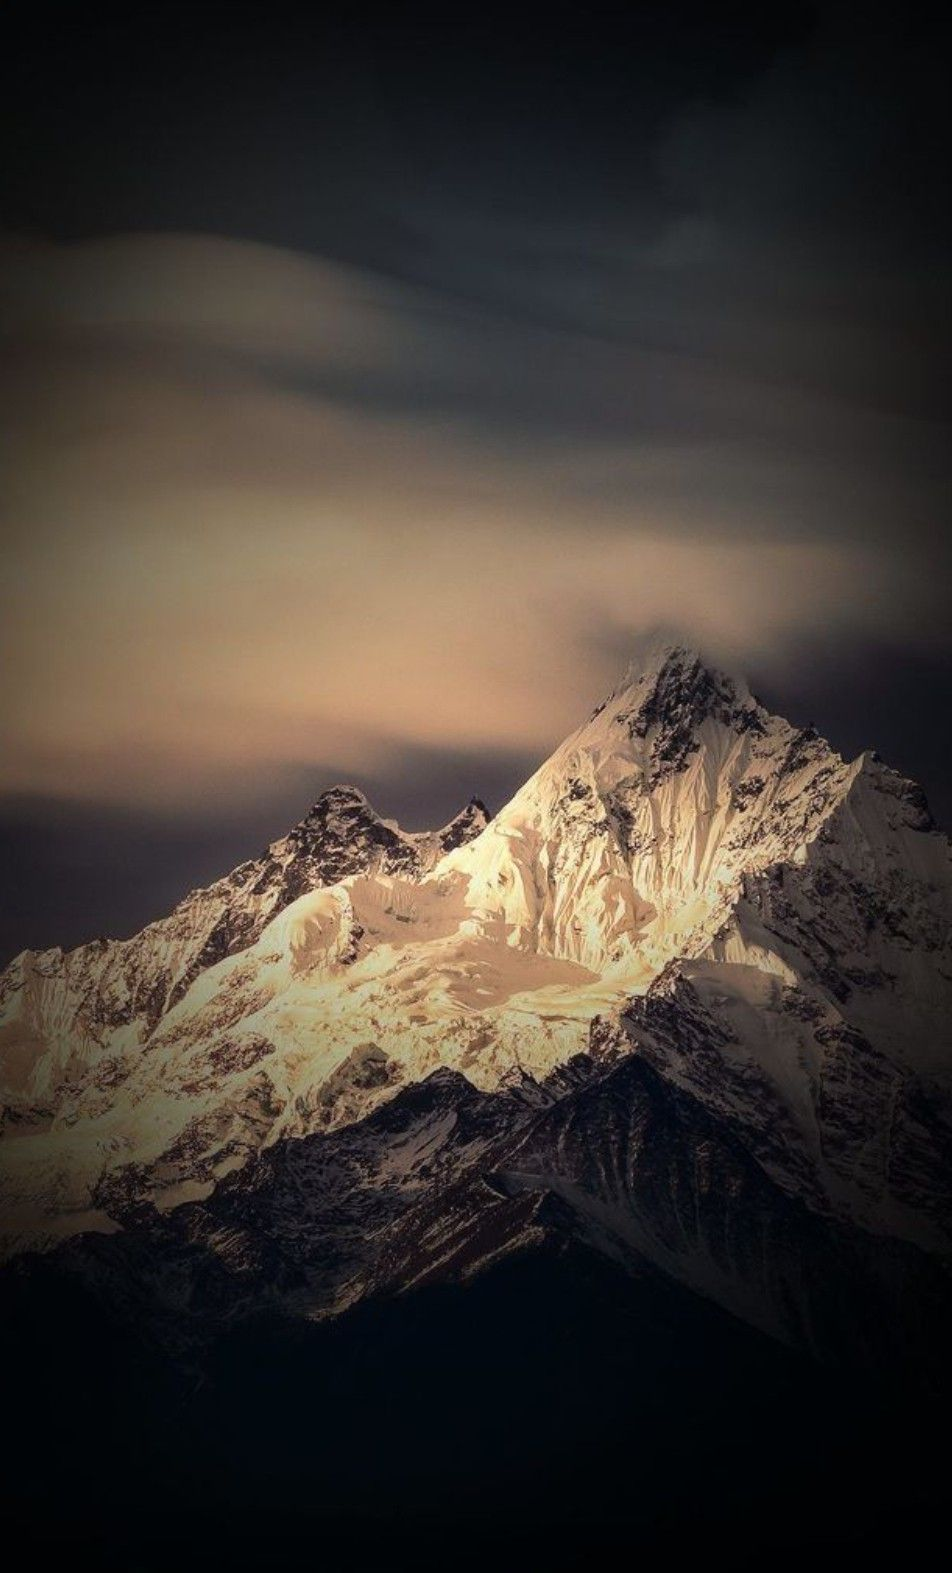 Himalayas Mountain Nature Wallpaper Amazing Hd Wallpapers Mountain Wallpaper